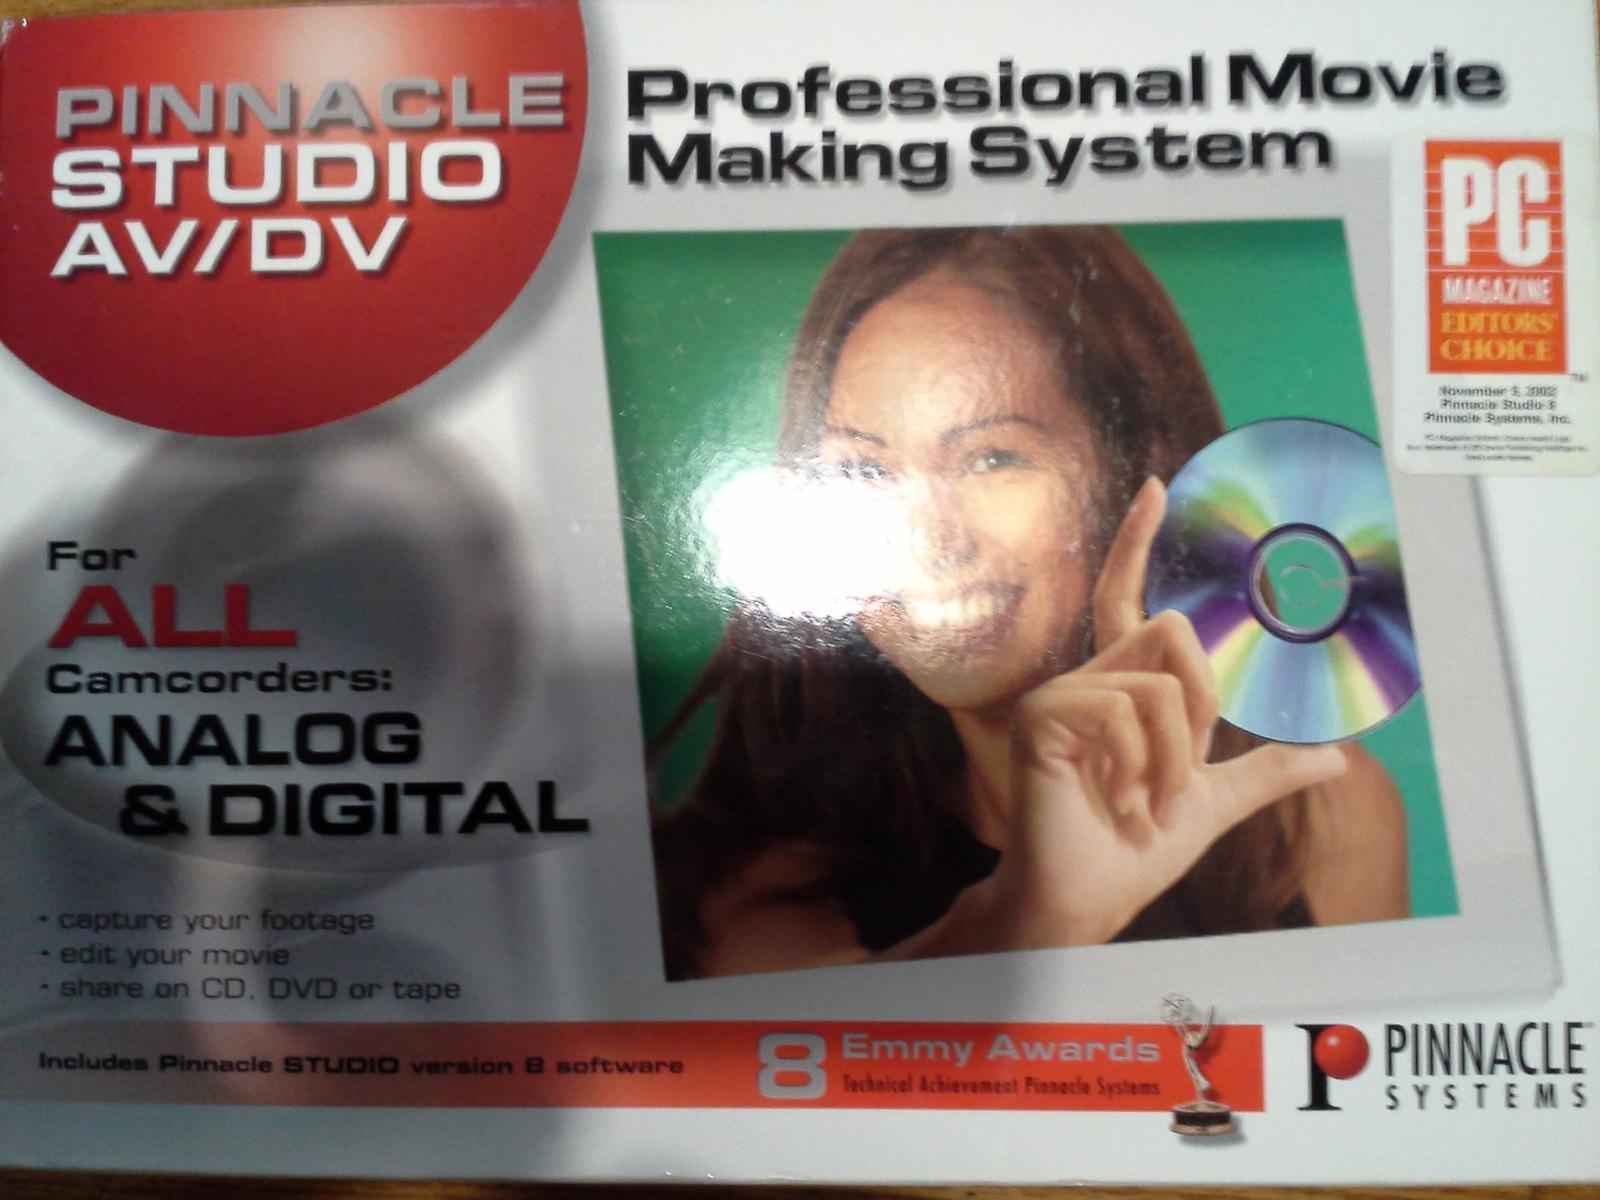 Pinnacle Studio Av/Dv (Retail Version 8 ) and 50 similar items